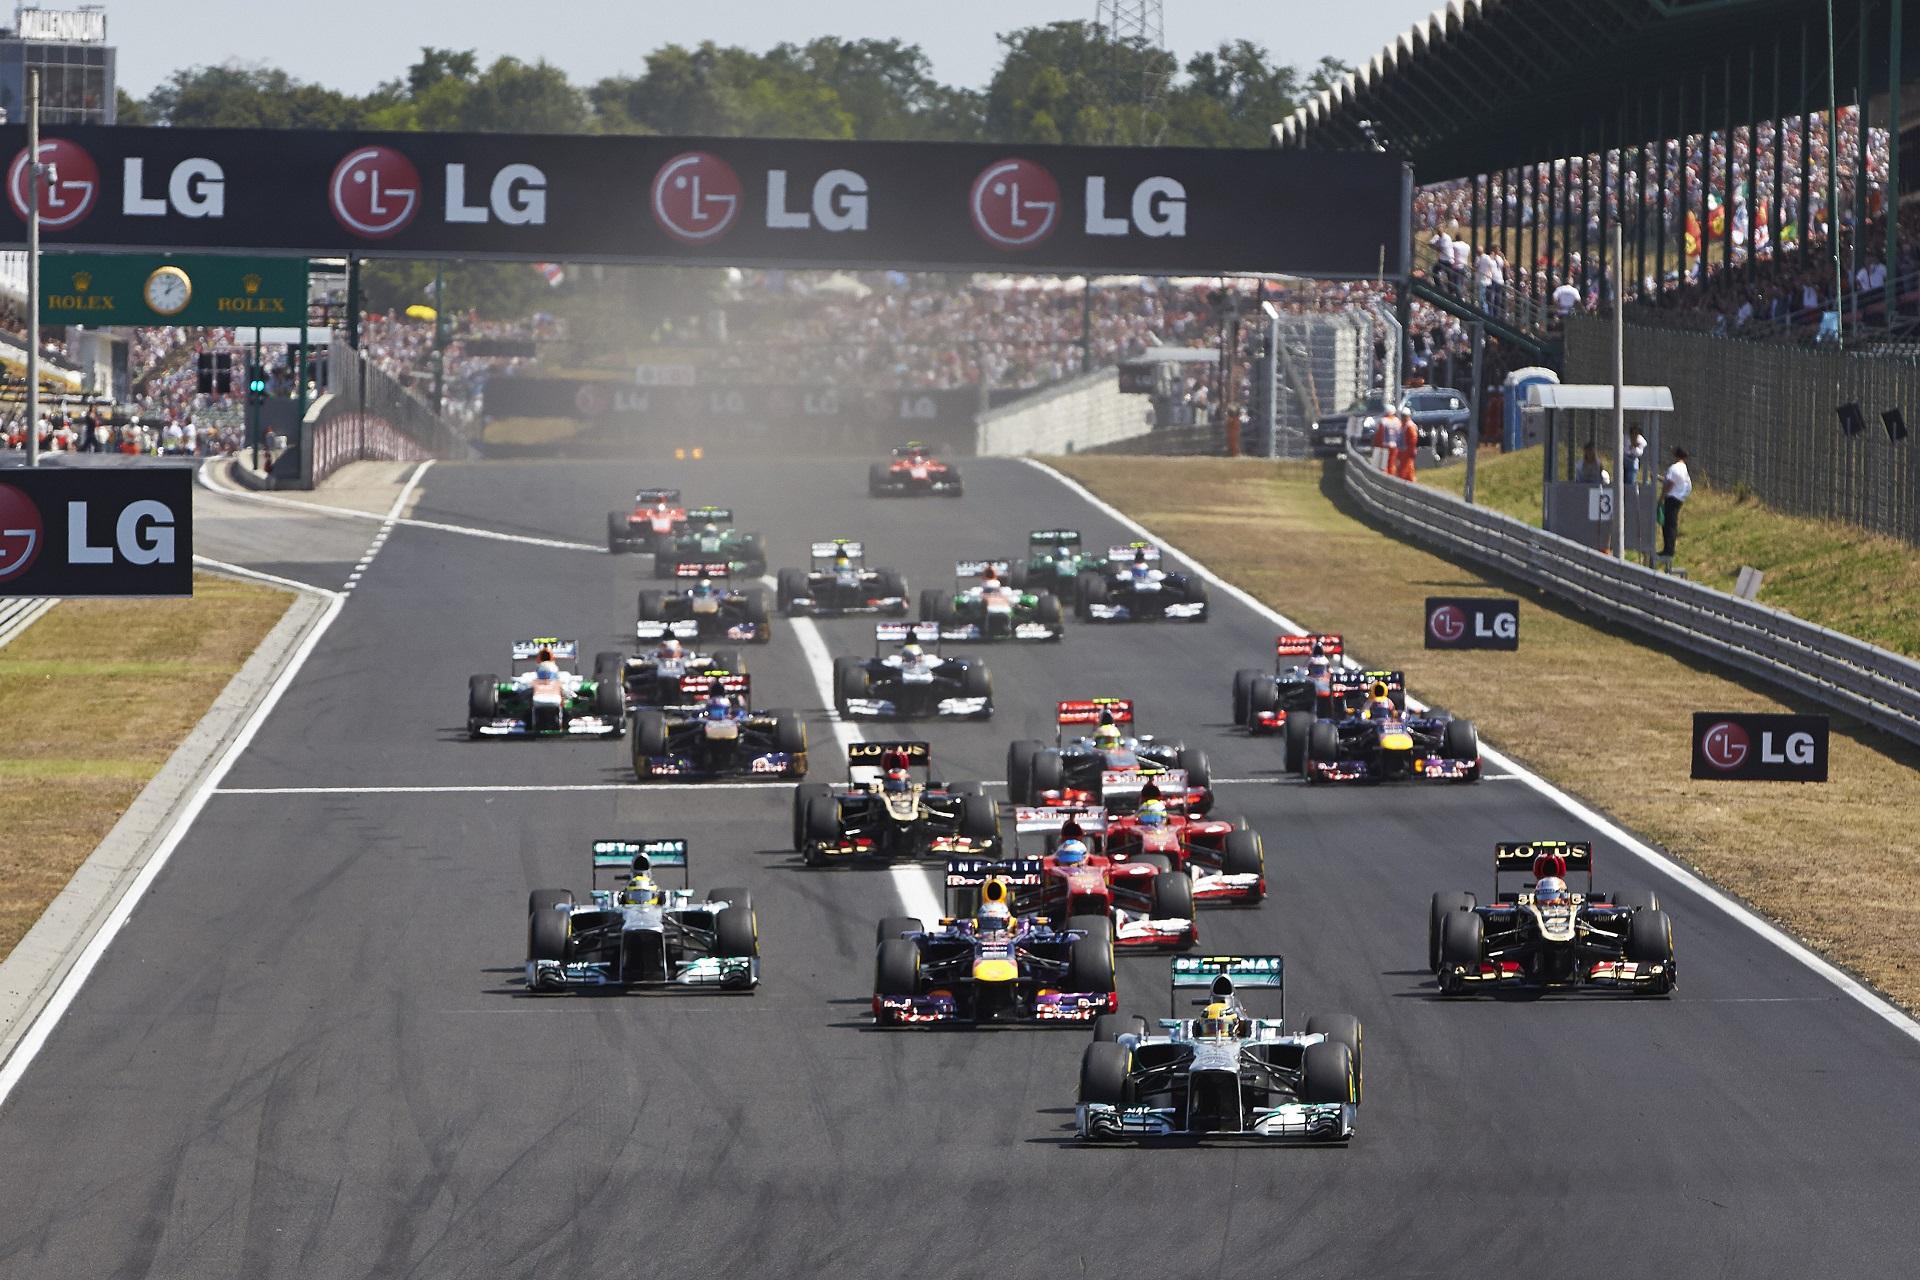 F1 2017 Car Wallpaper Hungary F1 Drive Wildside Group